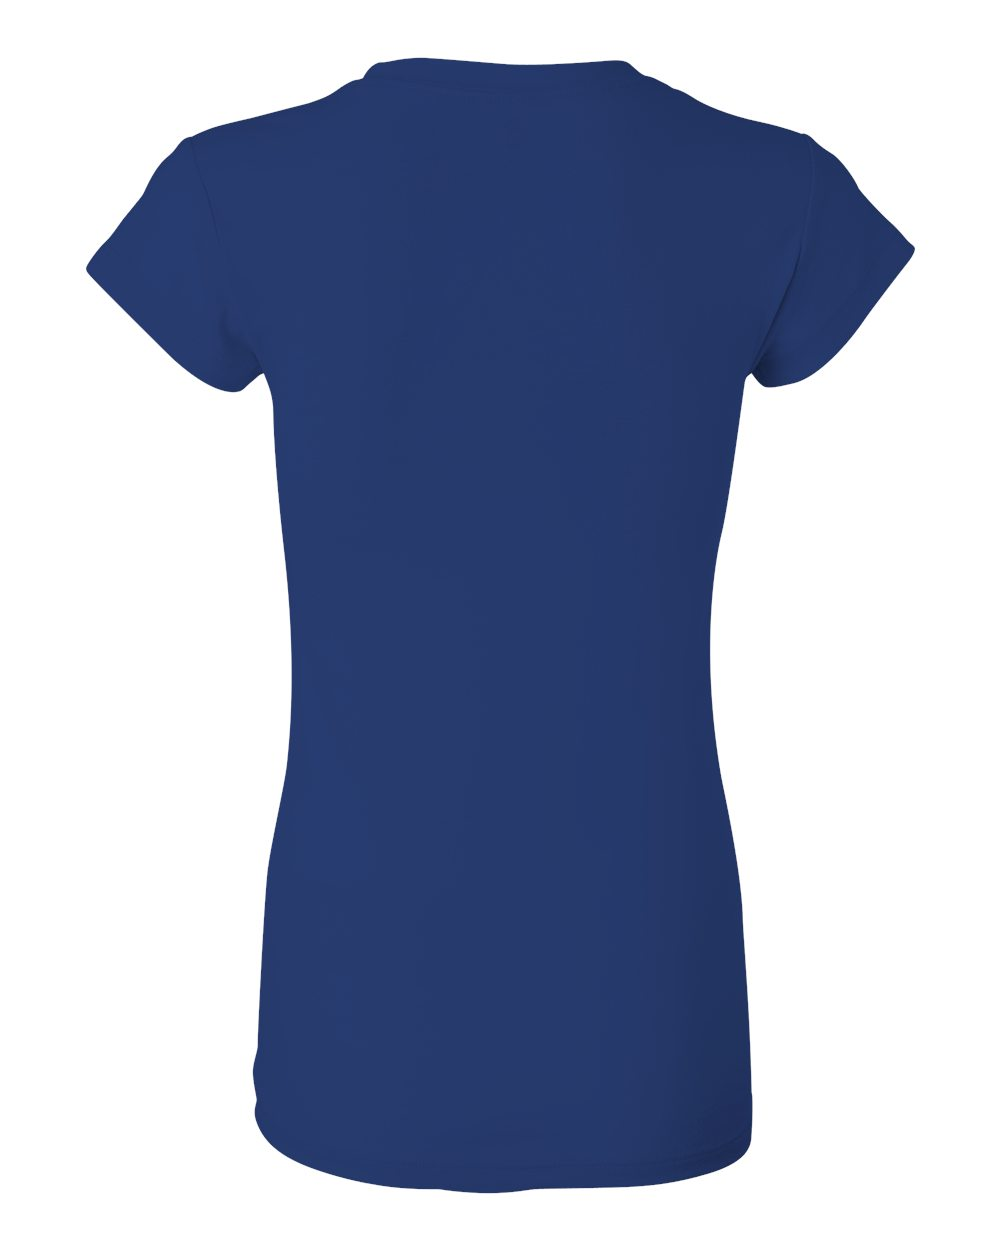 Bella-Canvas-Women-039-s-Sheer-Mini-Rib-Short-Sleeve-T-Shirt-8701-S-2XL thumbnail 34